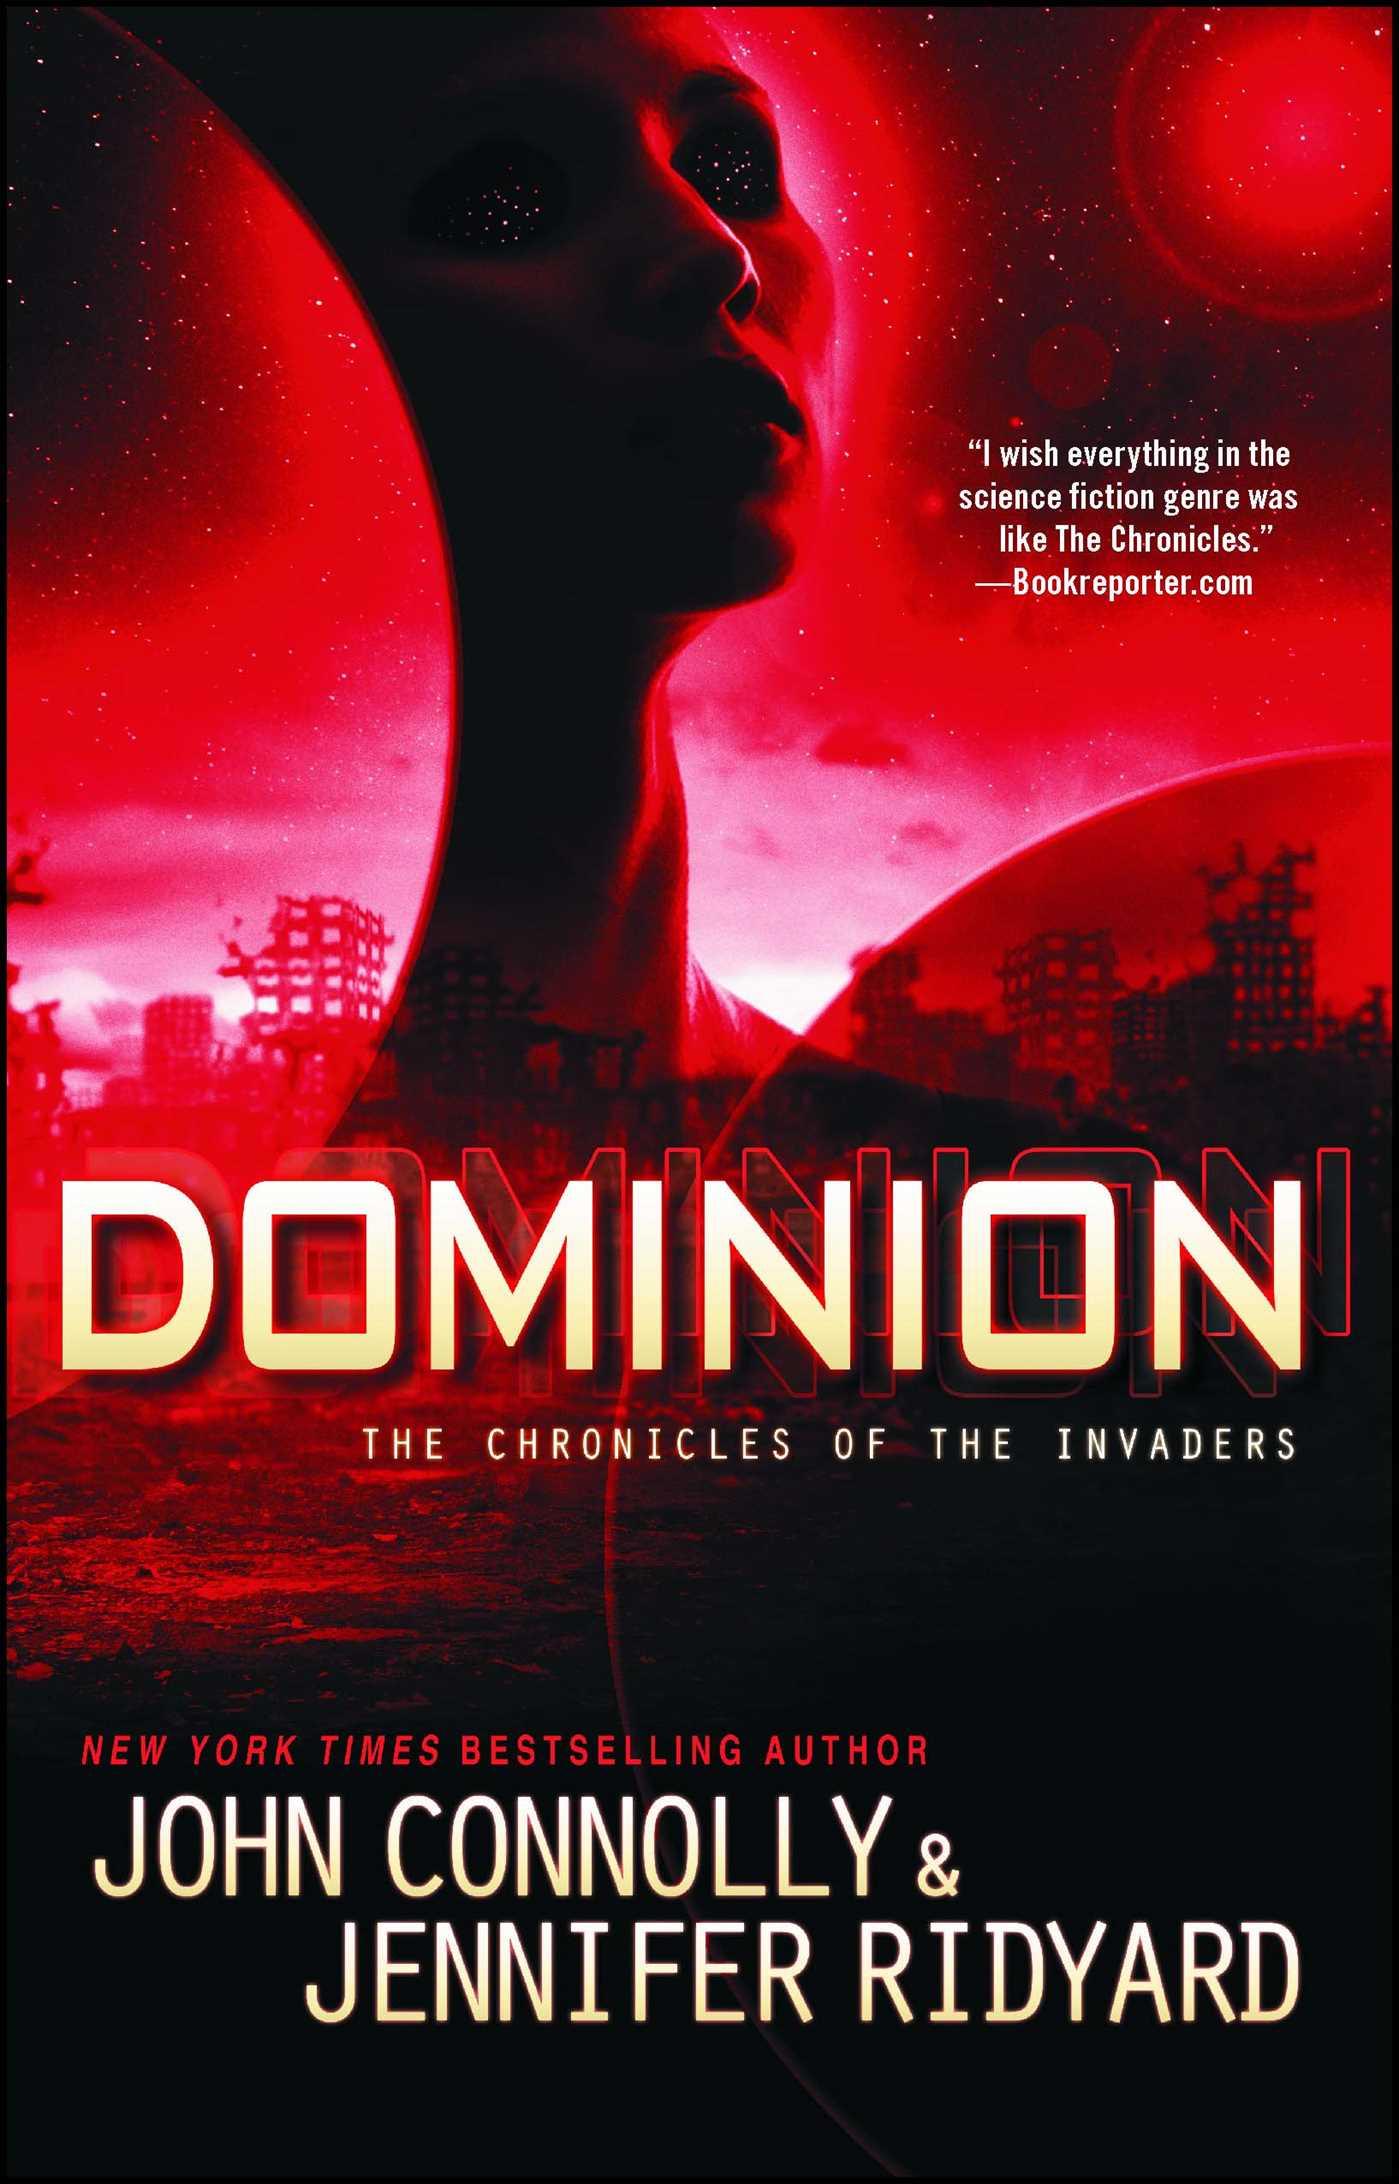 Dominion 9781476757209 hr